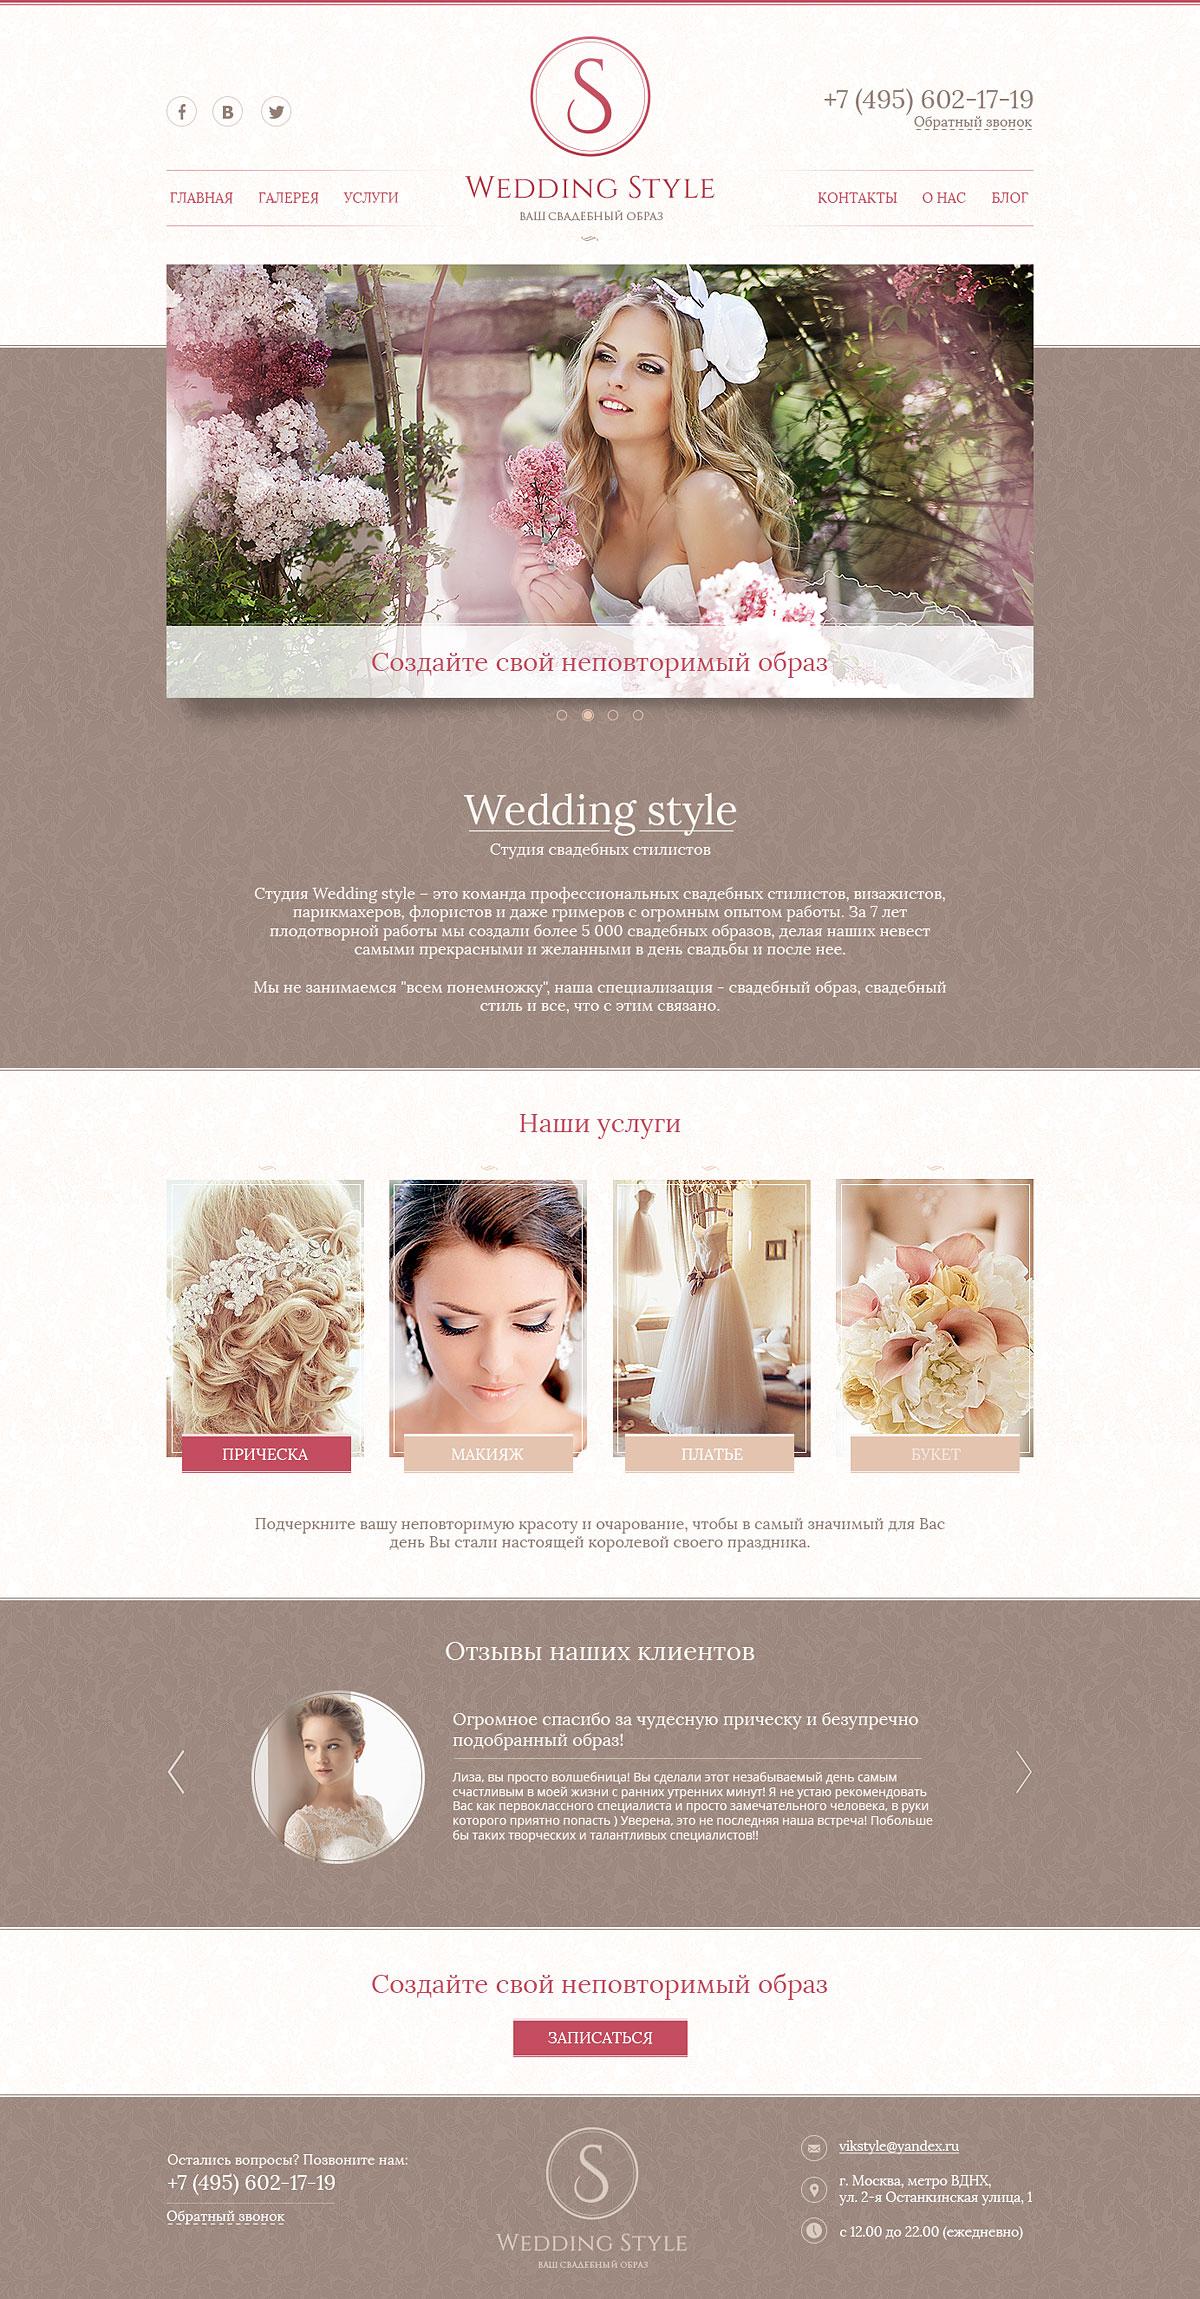 Wedding Style - конкурсная работа